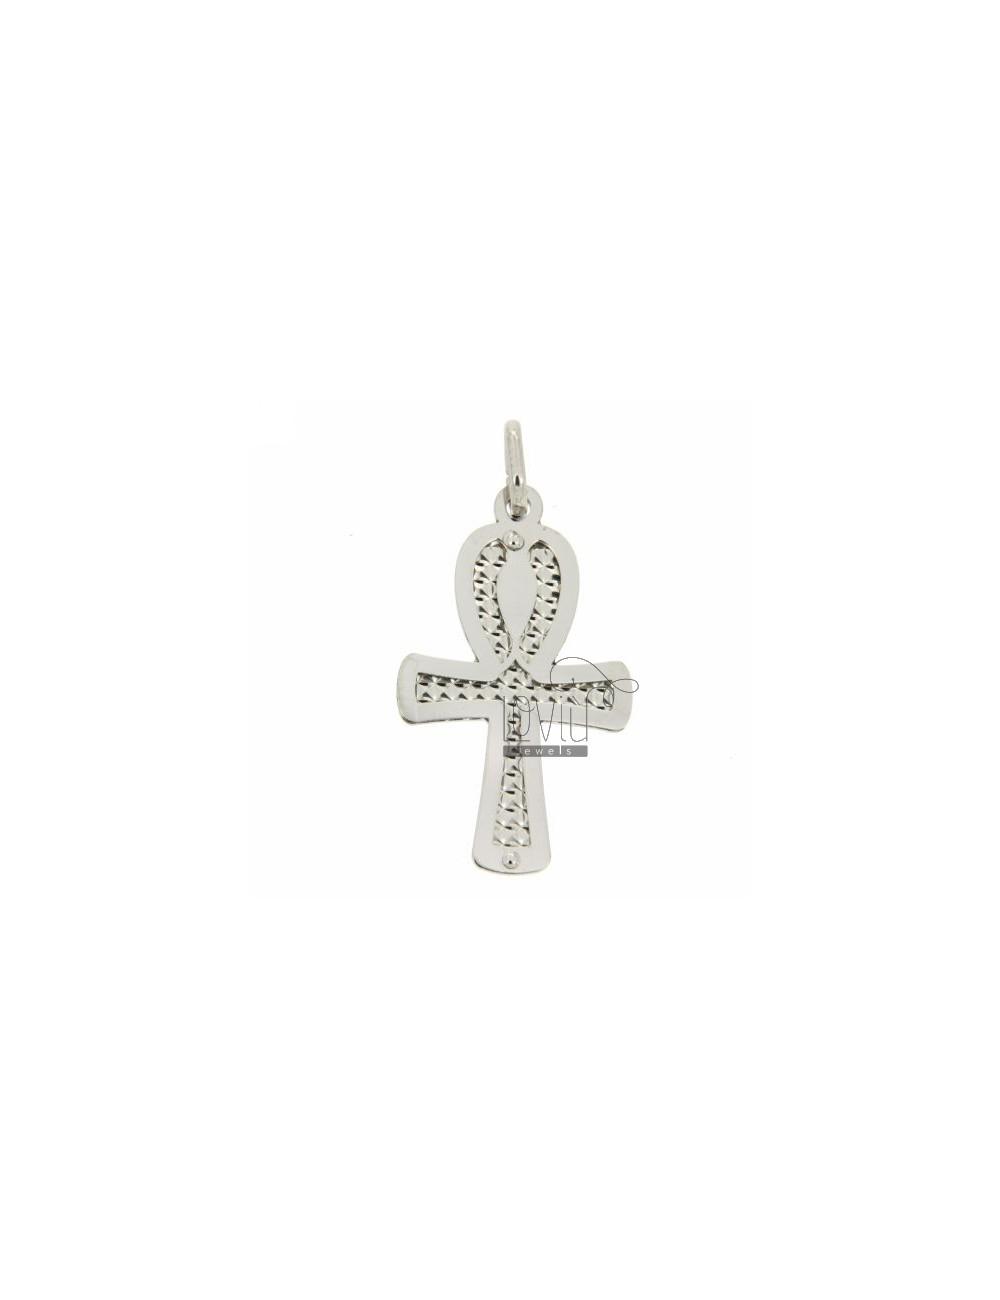 INSIDE DIAMOND CROSS PENDANT WITH RHODIUM SILVER 925